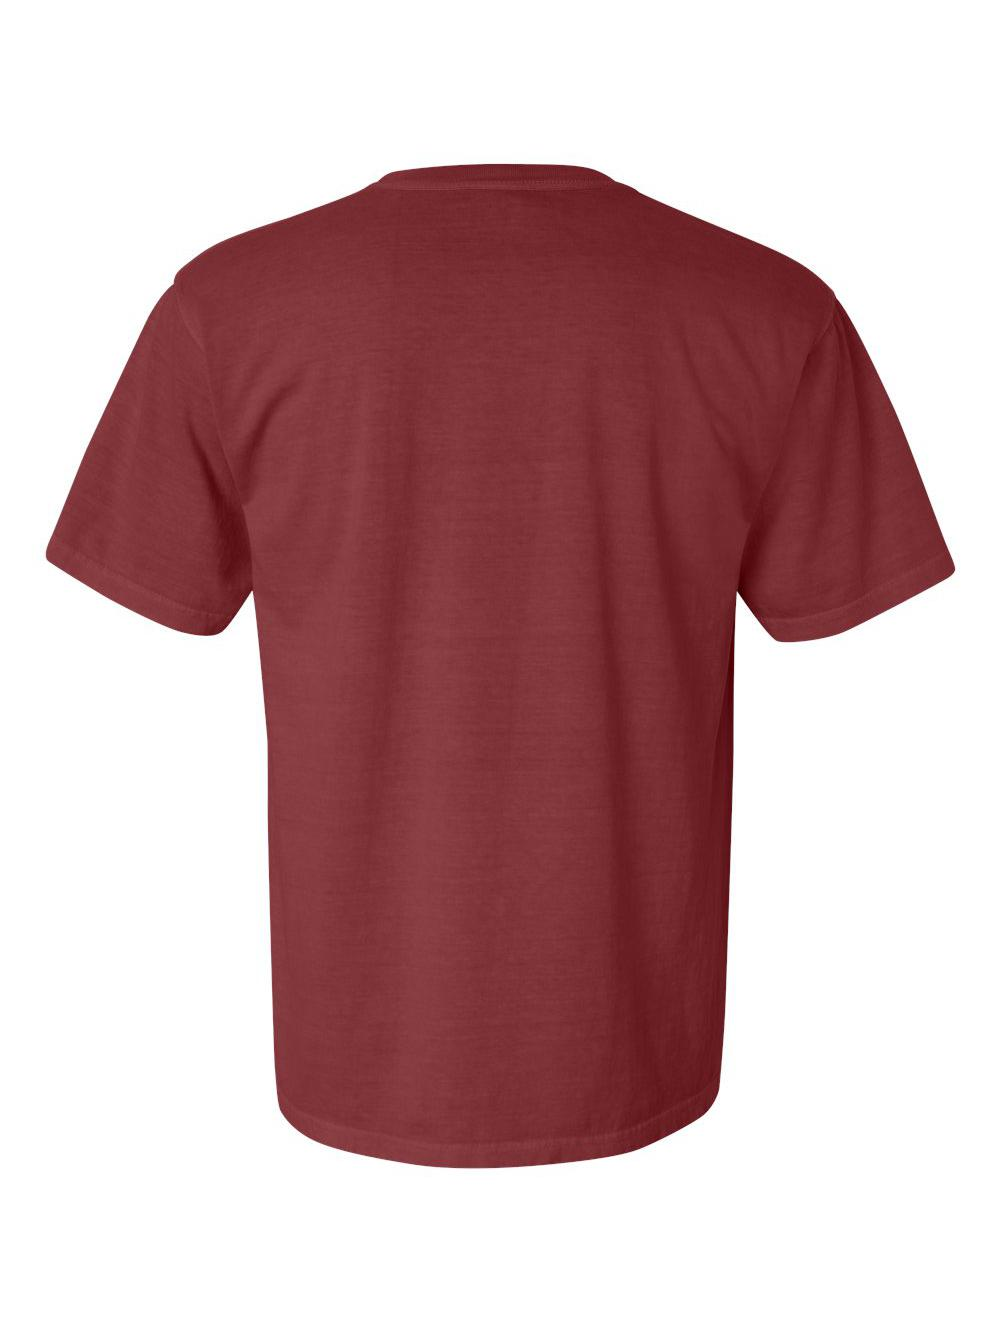 Comfort-Colors-Garment-Dyed-Heavyweight-Ringspun-Short-Sleeve-Shirt-1717 thumbnail 19